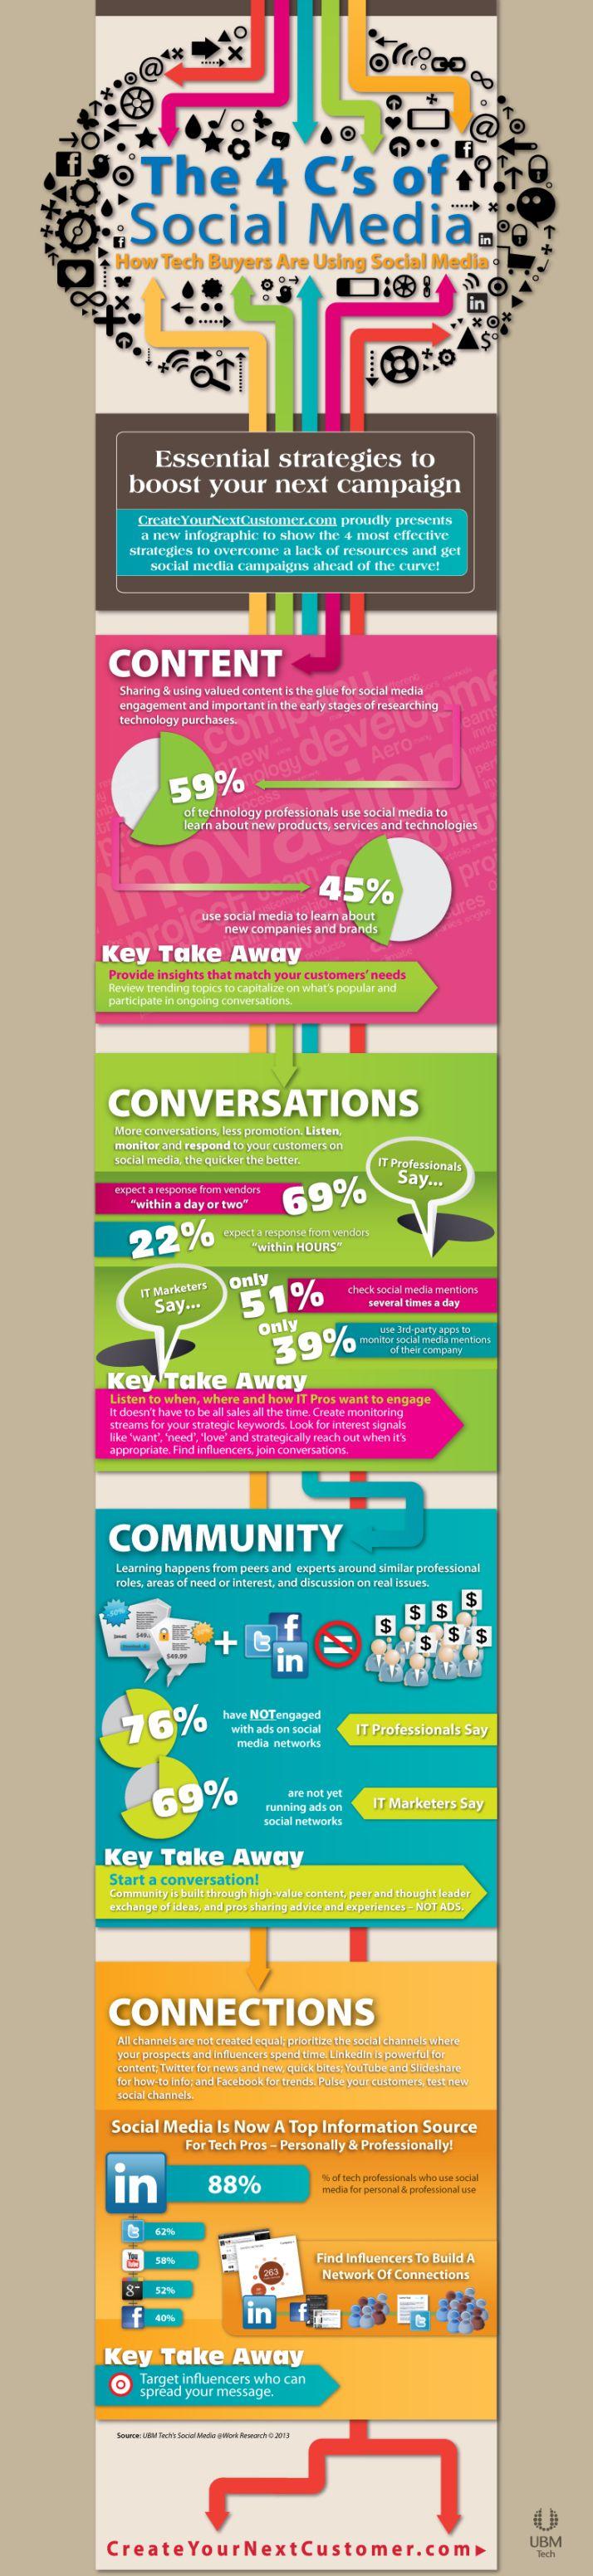 Las 4 C del Social Media :: http://materialesmarketing.wordpress.com/2013/03/31/las-cuatro-cs-del-social-media/